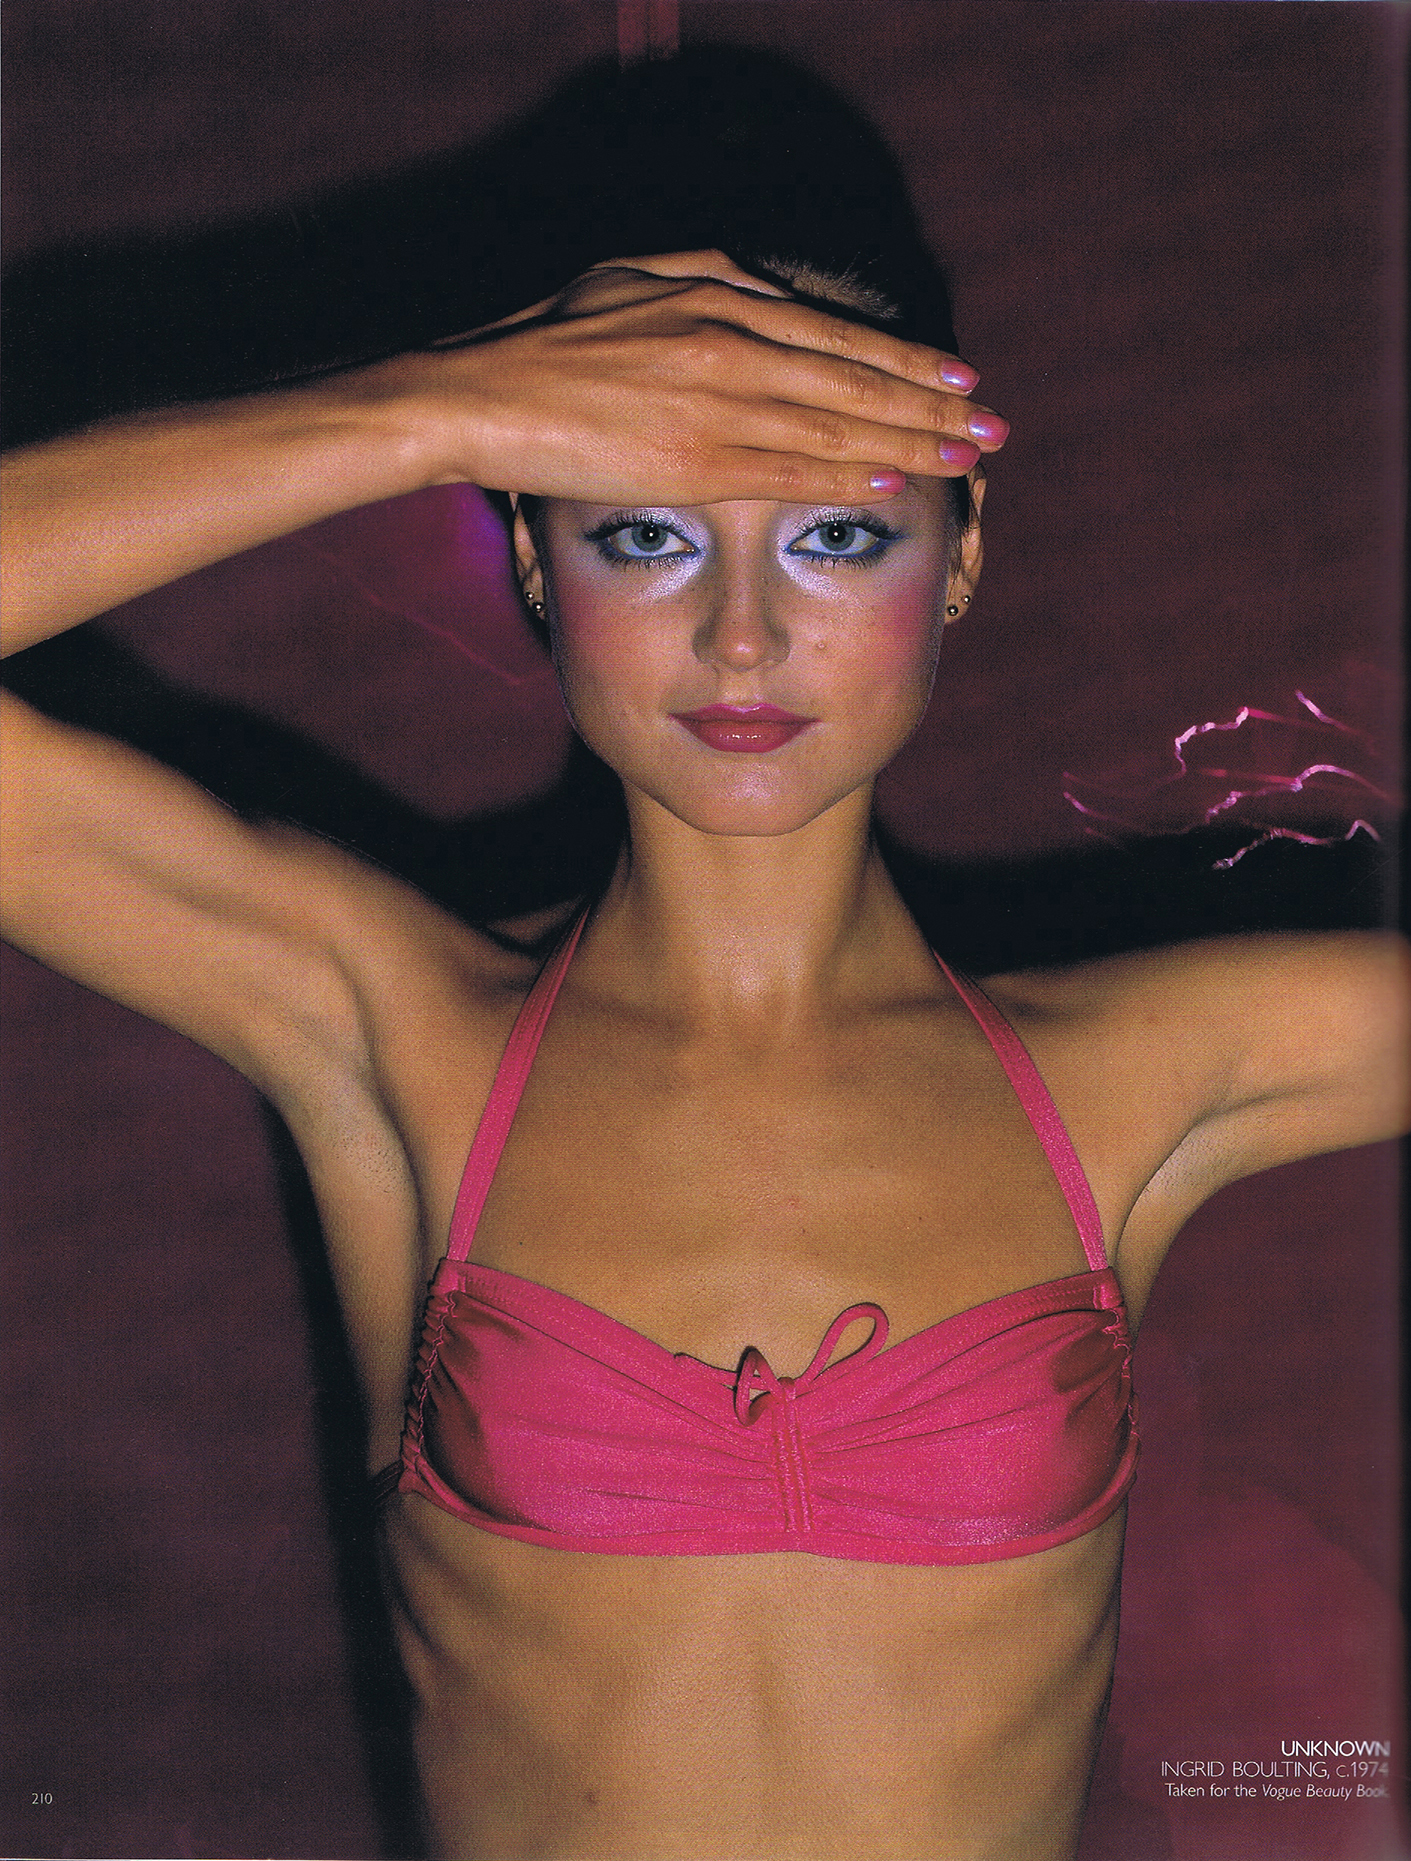 An unpolished photograph of Ingrid Boulting taken for Vogue UK, 1974.